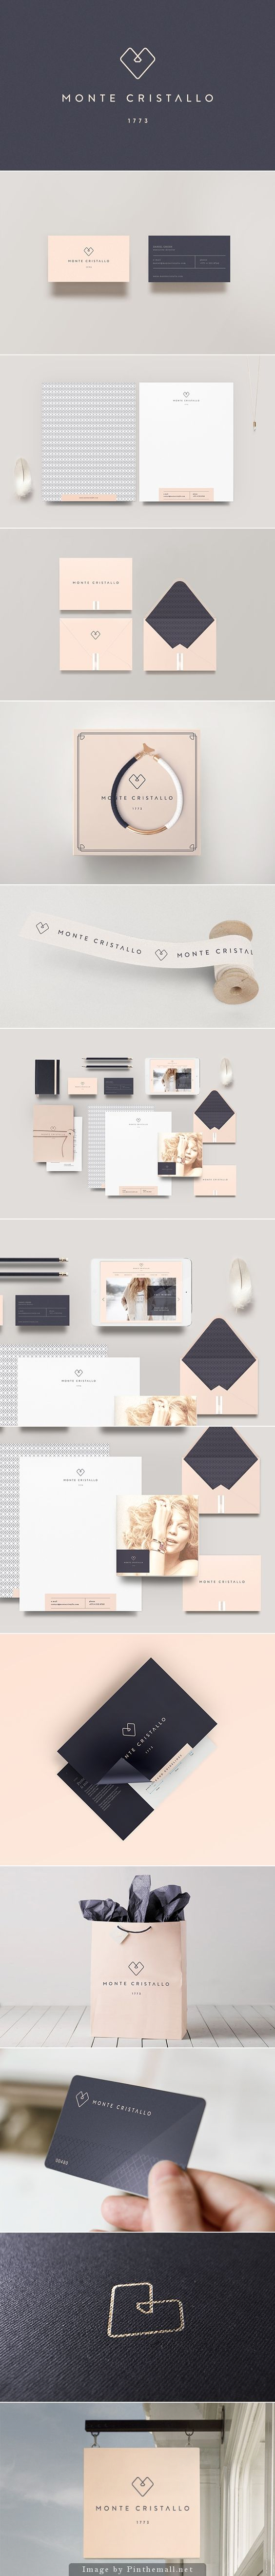 13.Uma identidade visual despojada, moderna e minimalista para uma loja de joias!  #IdentidadeVisual #Logo #Propaganda #Branding #Creative #TudoMarketing #TudoMkt